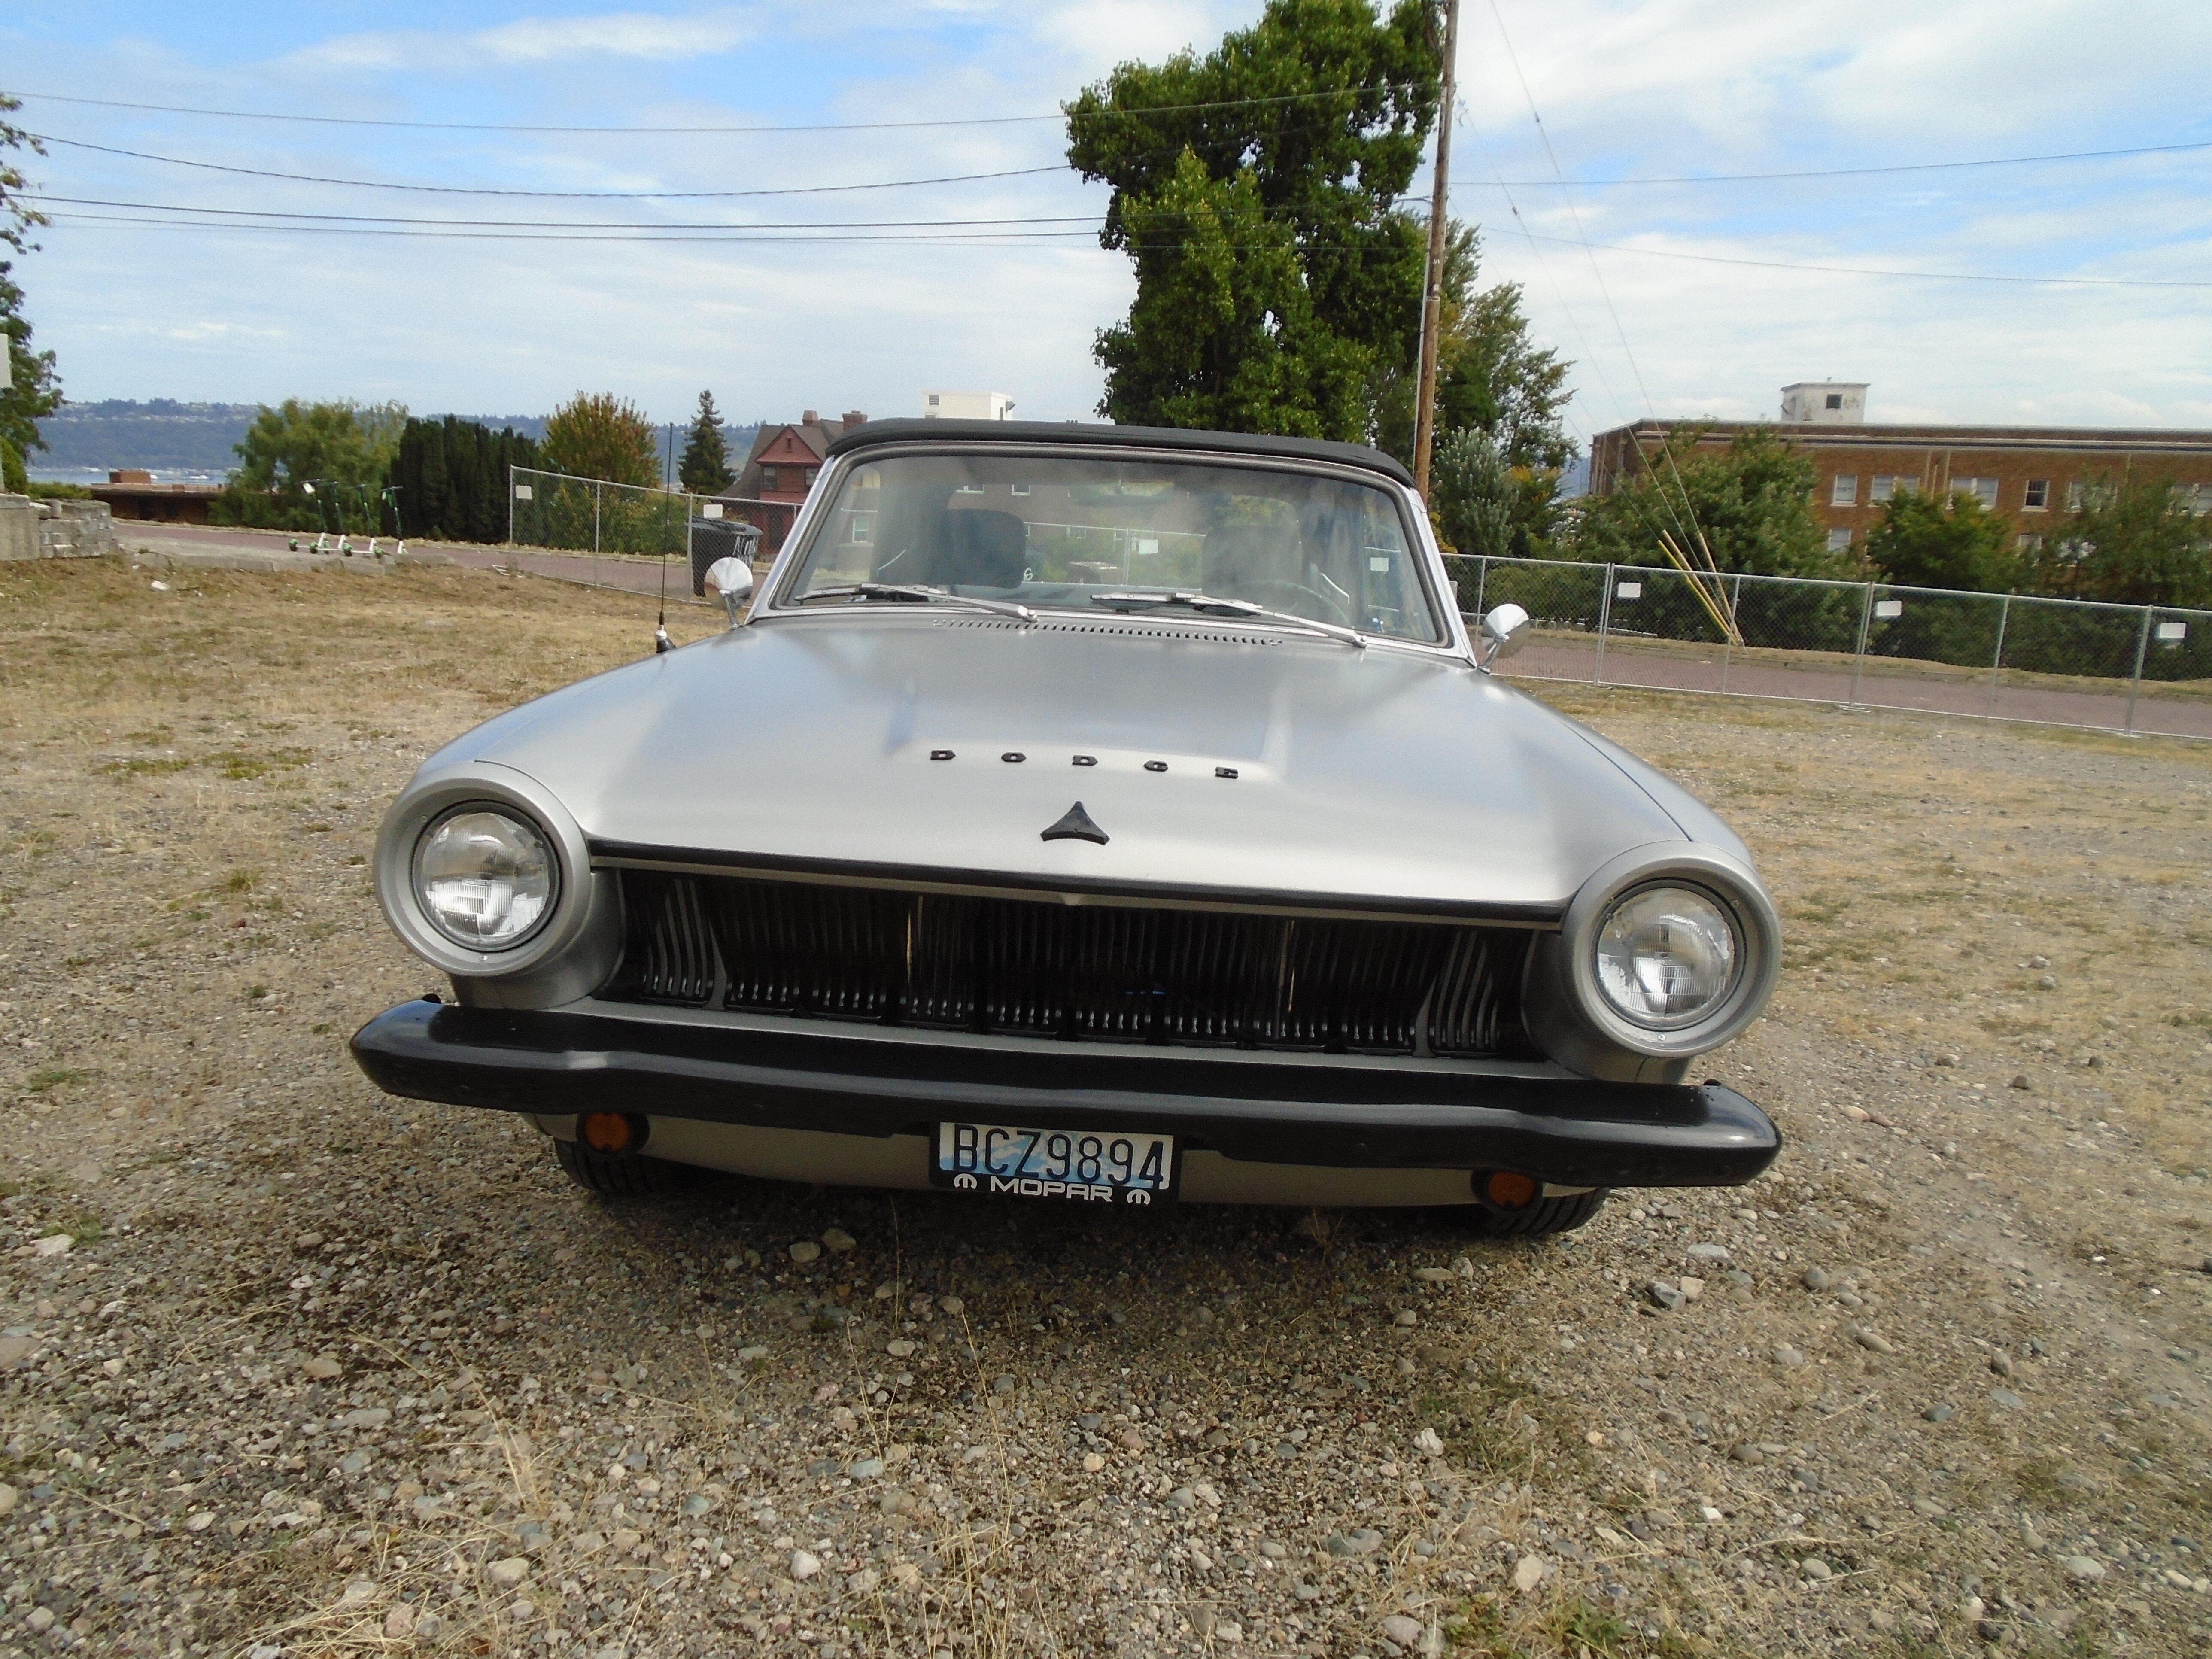 1963 Dodge Dart For Sale Near Tacoma Washington 98402 Classics On Autotrader